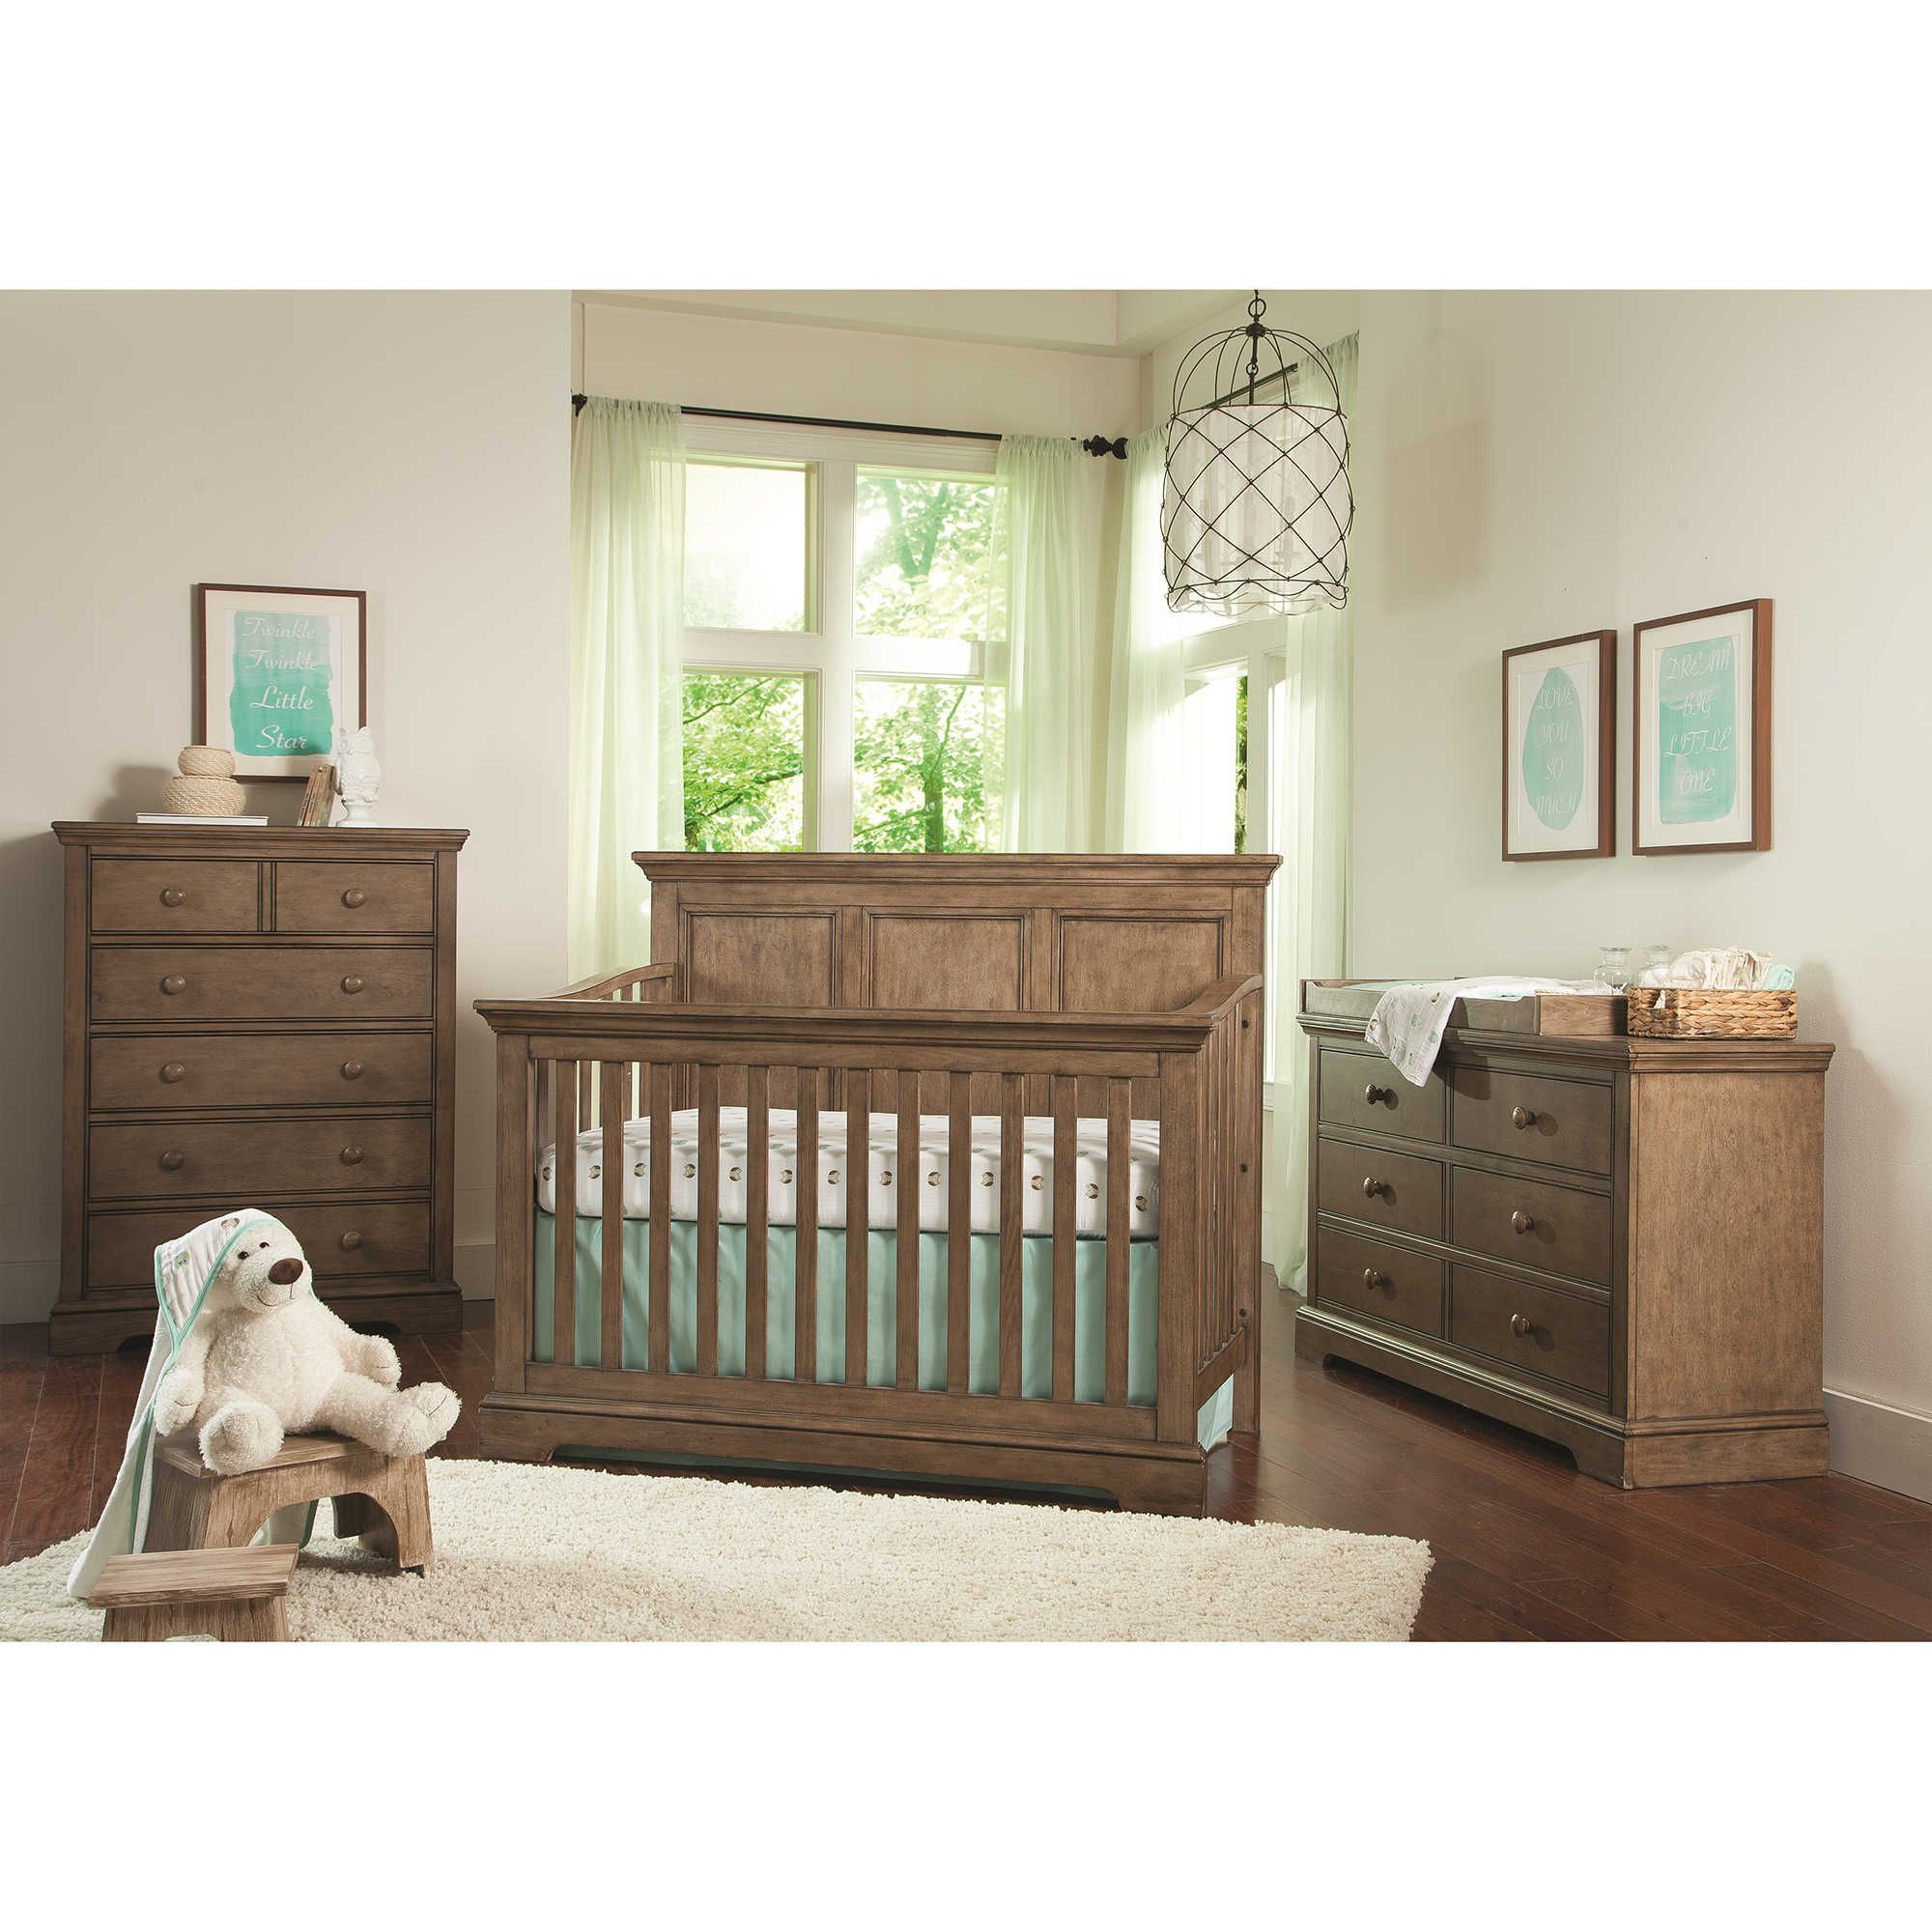 Westwood Design Hanley 4 In 1 Convertible Crib In Cashew Boys Nursery Furniture Nursery Furniture Sets Baby Furniture Sets